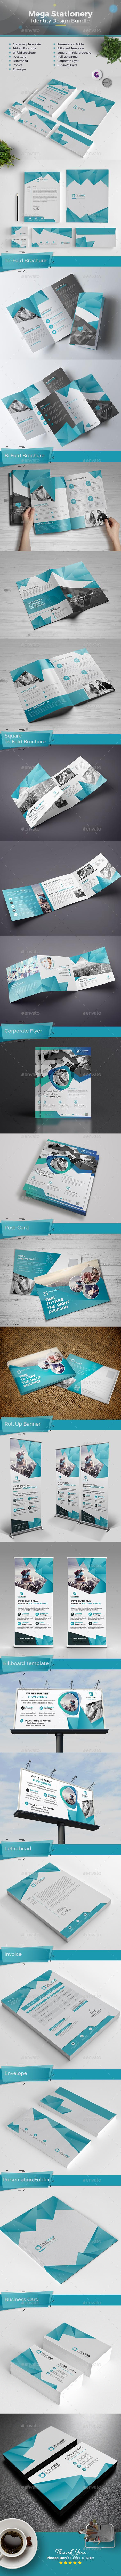 Branding Mega Identity Template Bundle - Stationery Print Templates